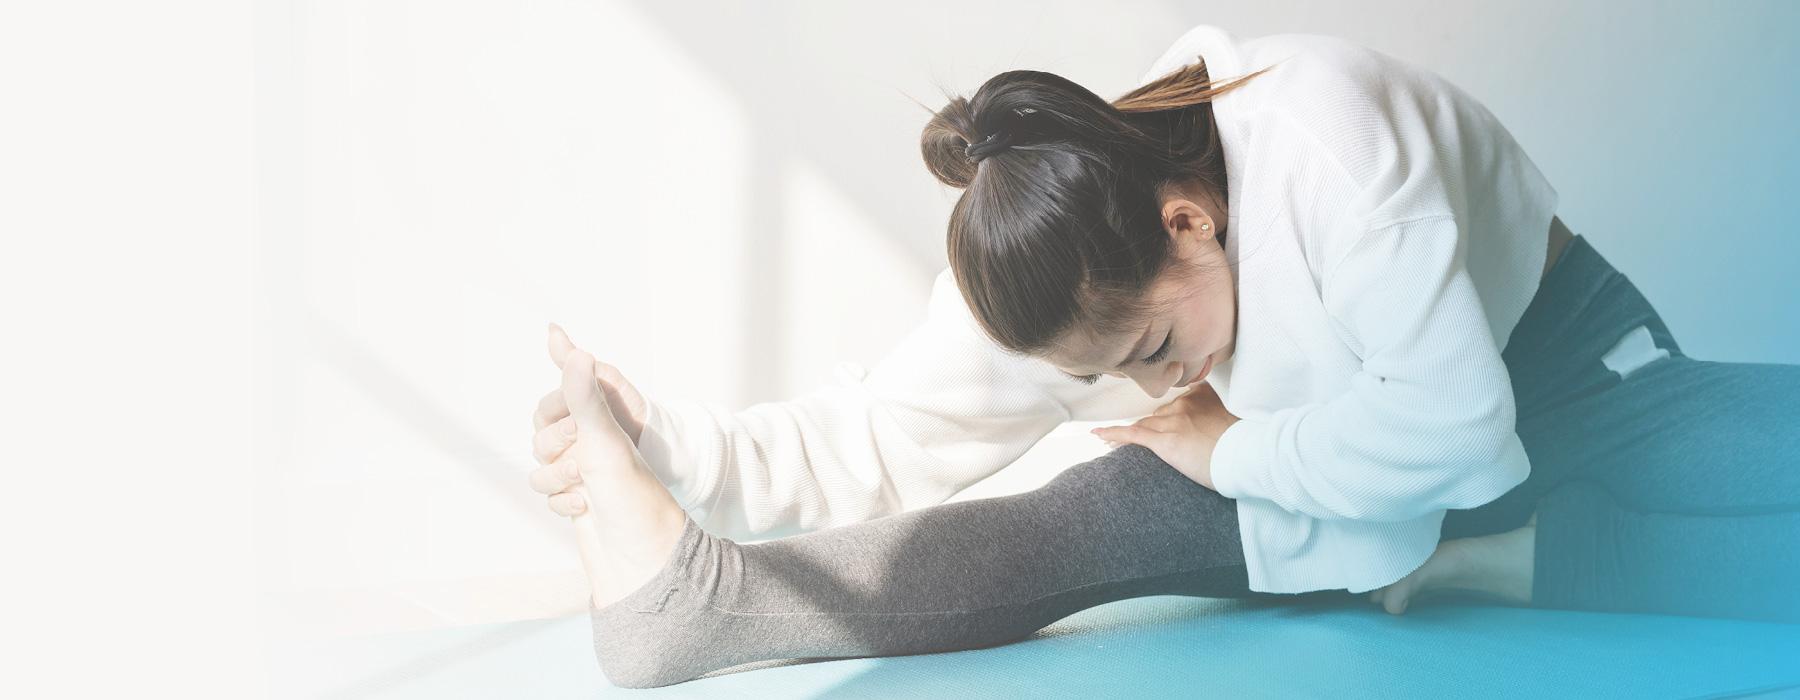 Woman stretching in yoga studio.